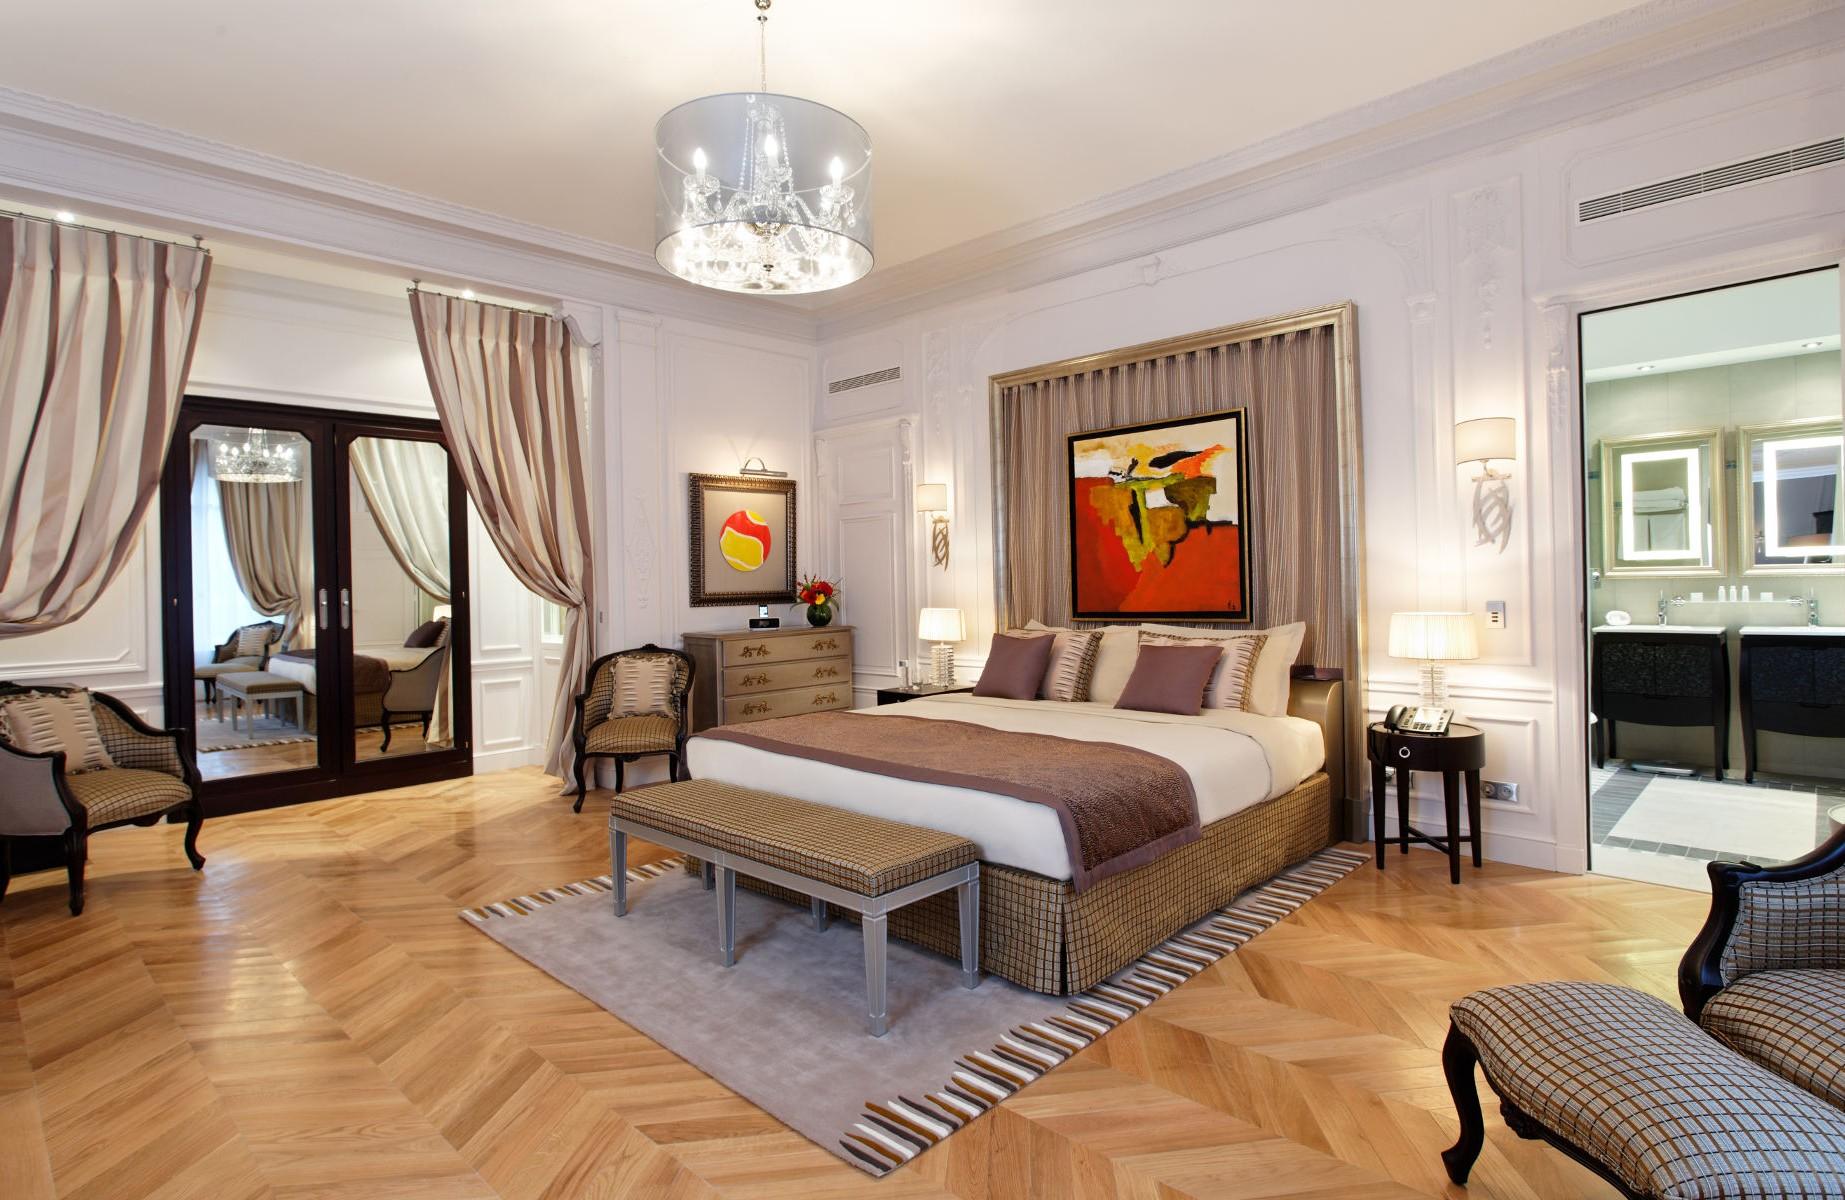 Majestic Hotel Spa, Paris